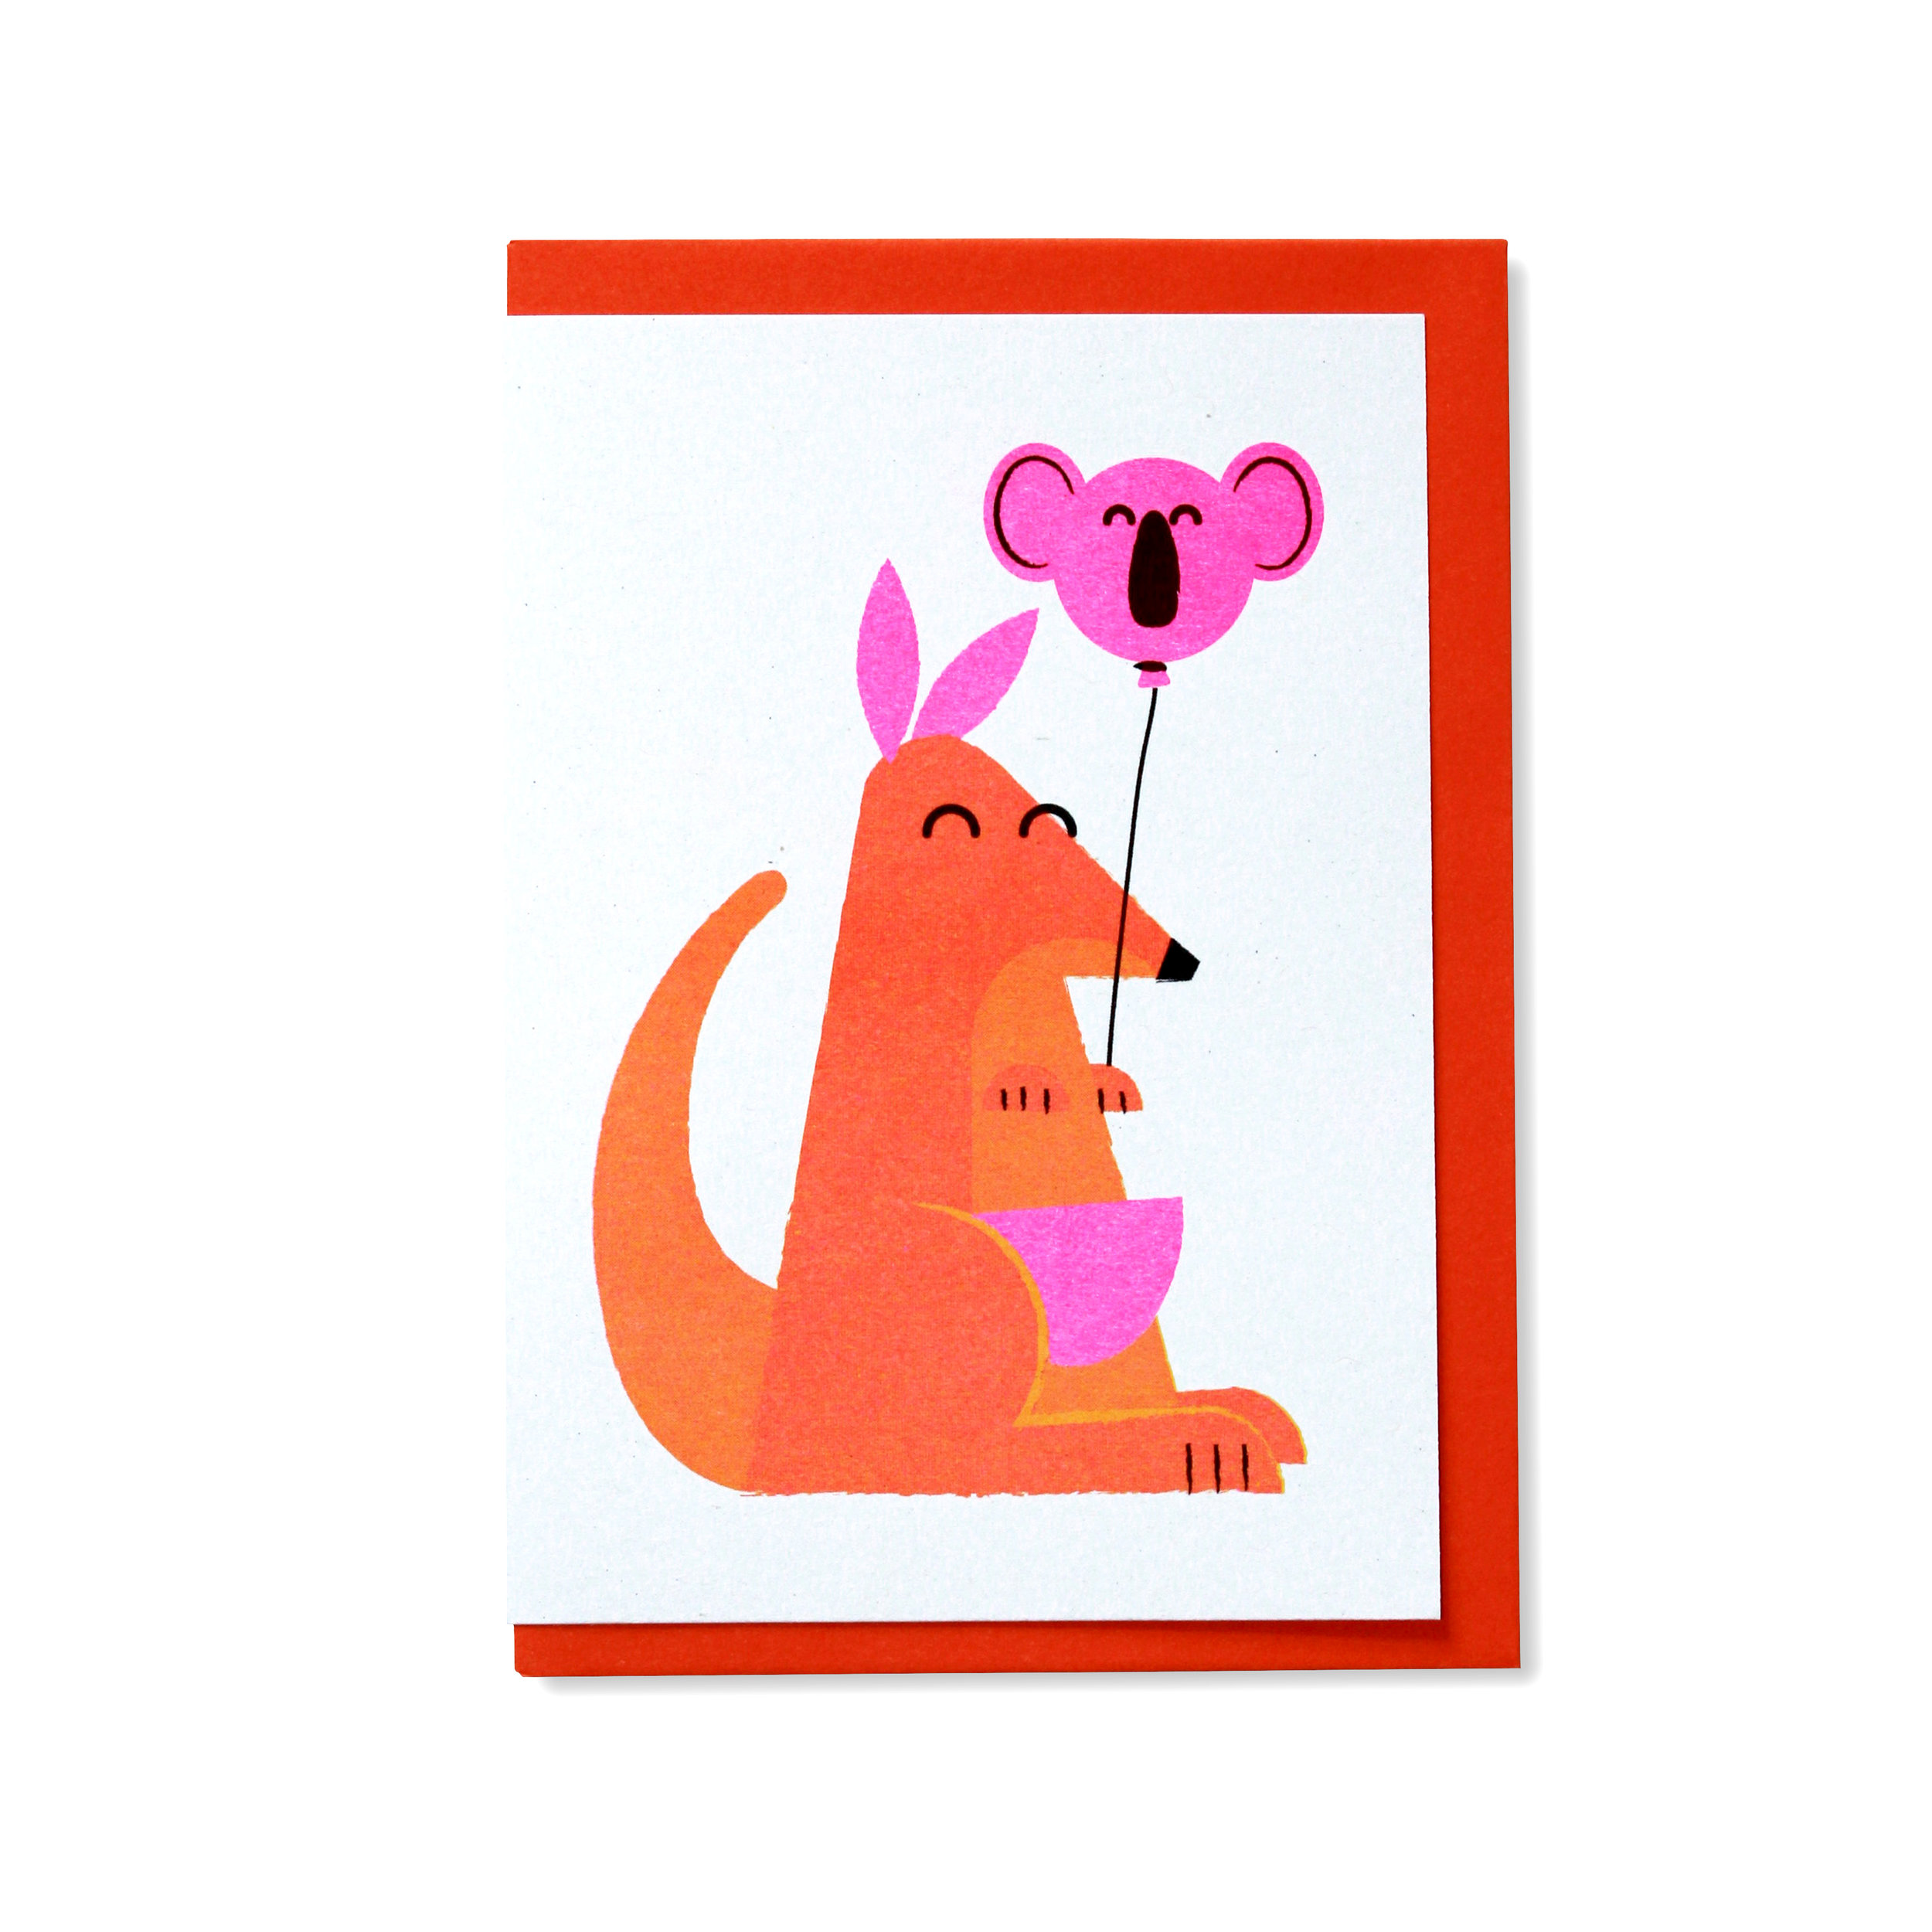 Kangaroo-and-Balloon.jpg